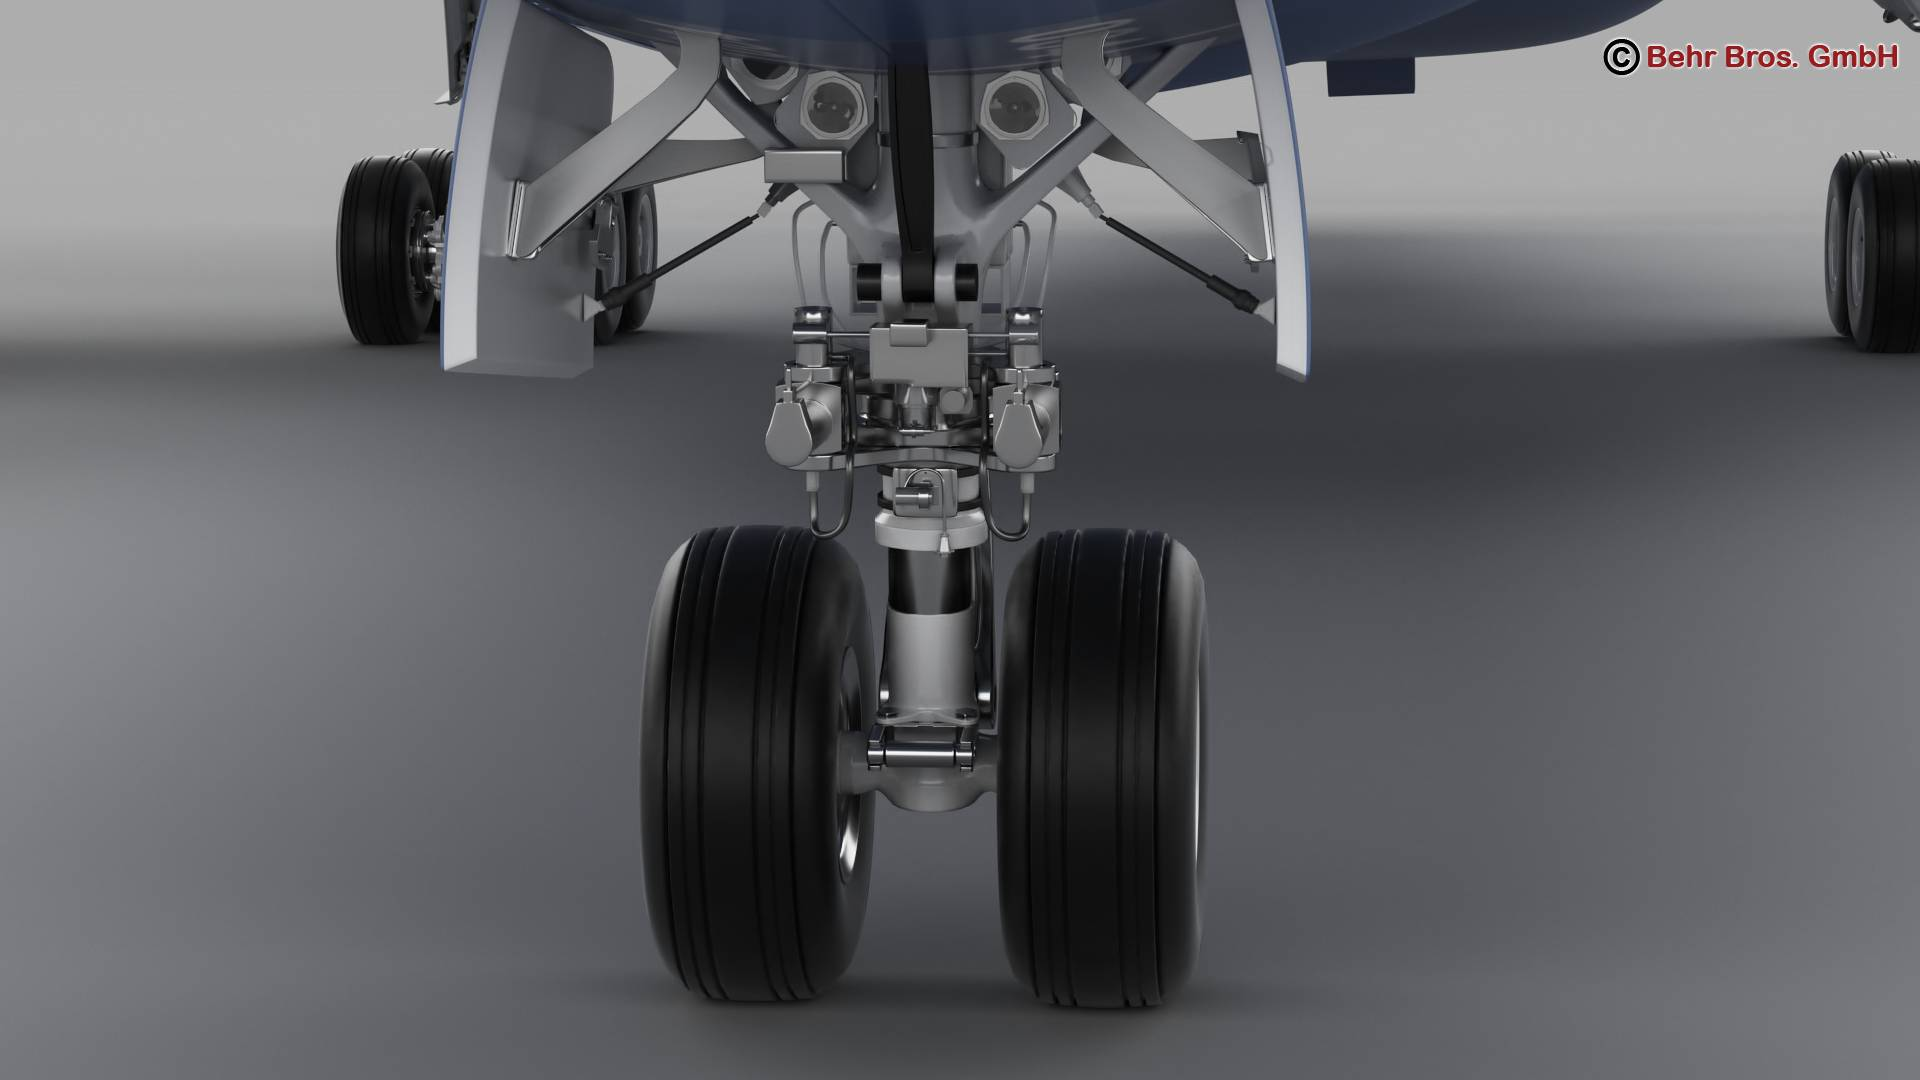 boeing 787-8 3d model 3ds max fbx c4d lwo ma mb obj 251348